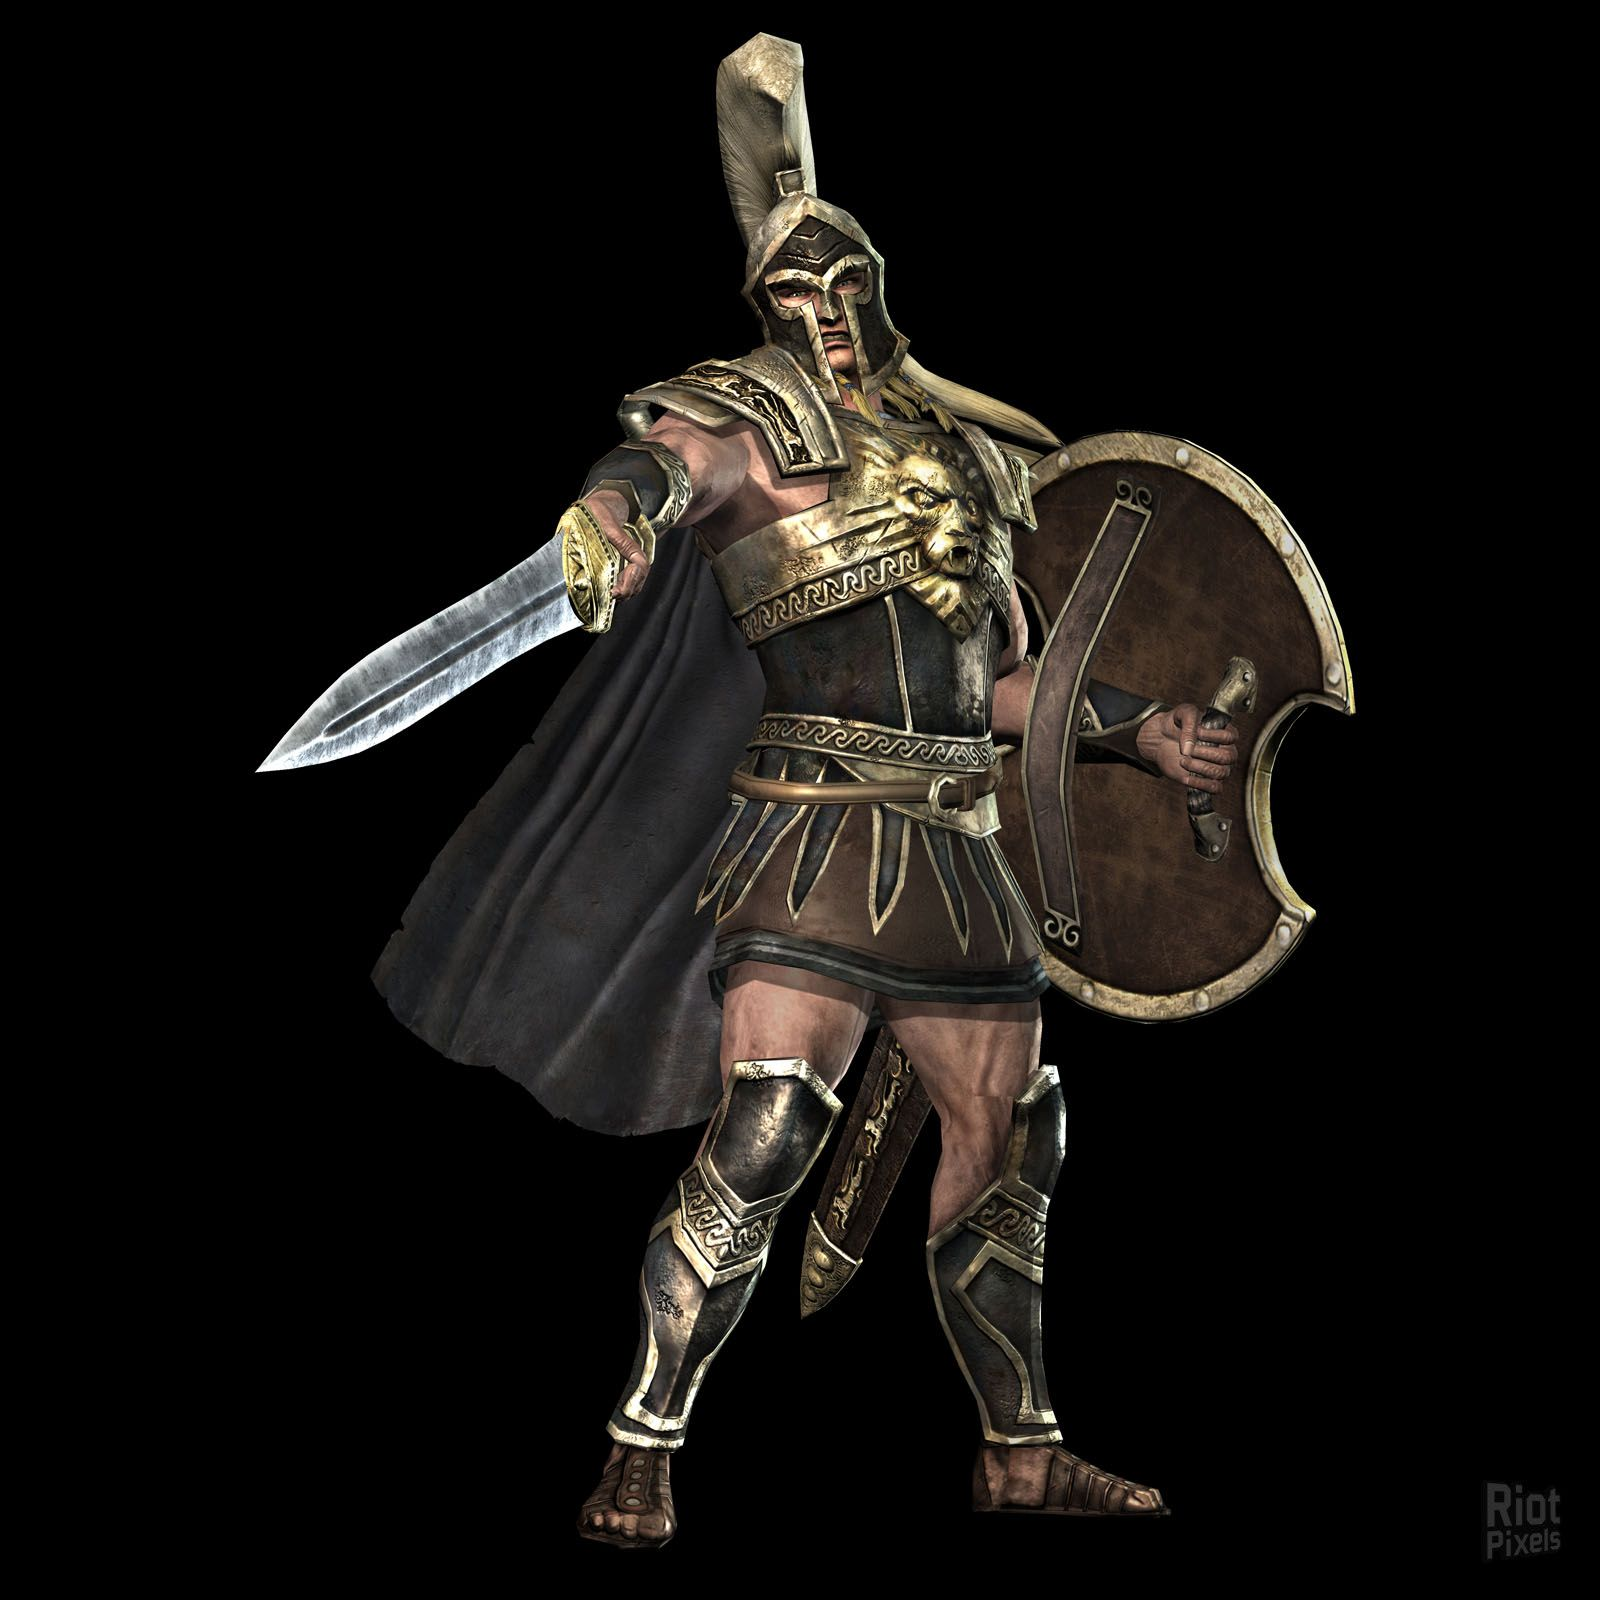 Warriors Legends Of Troy Pc Version: Game Artworks At Riot Pixels